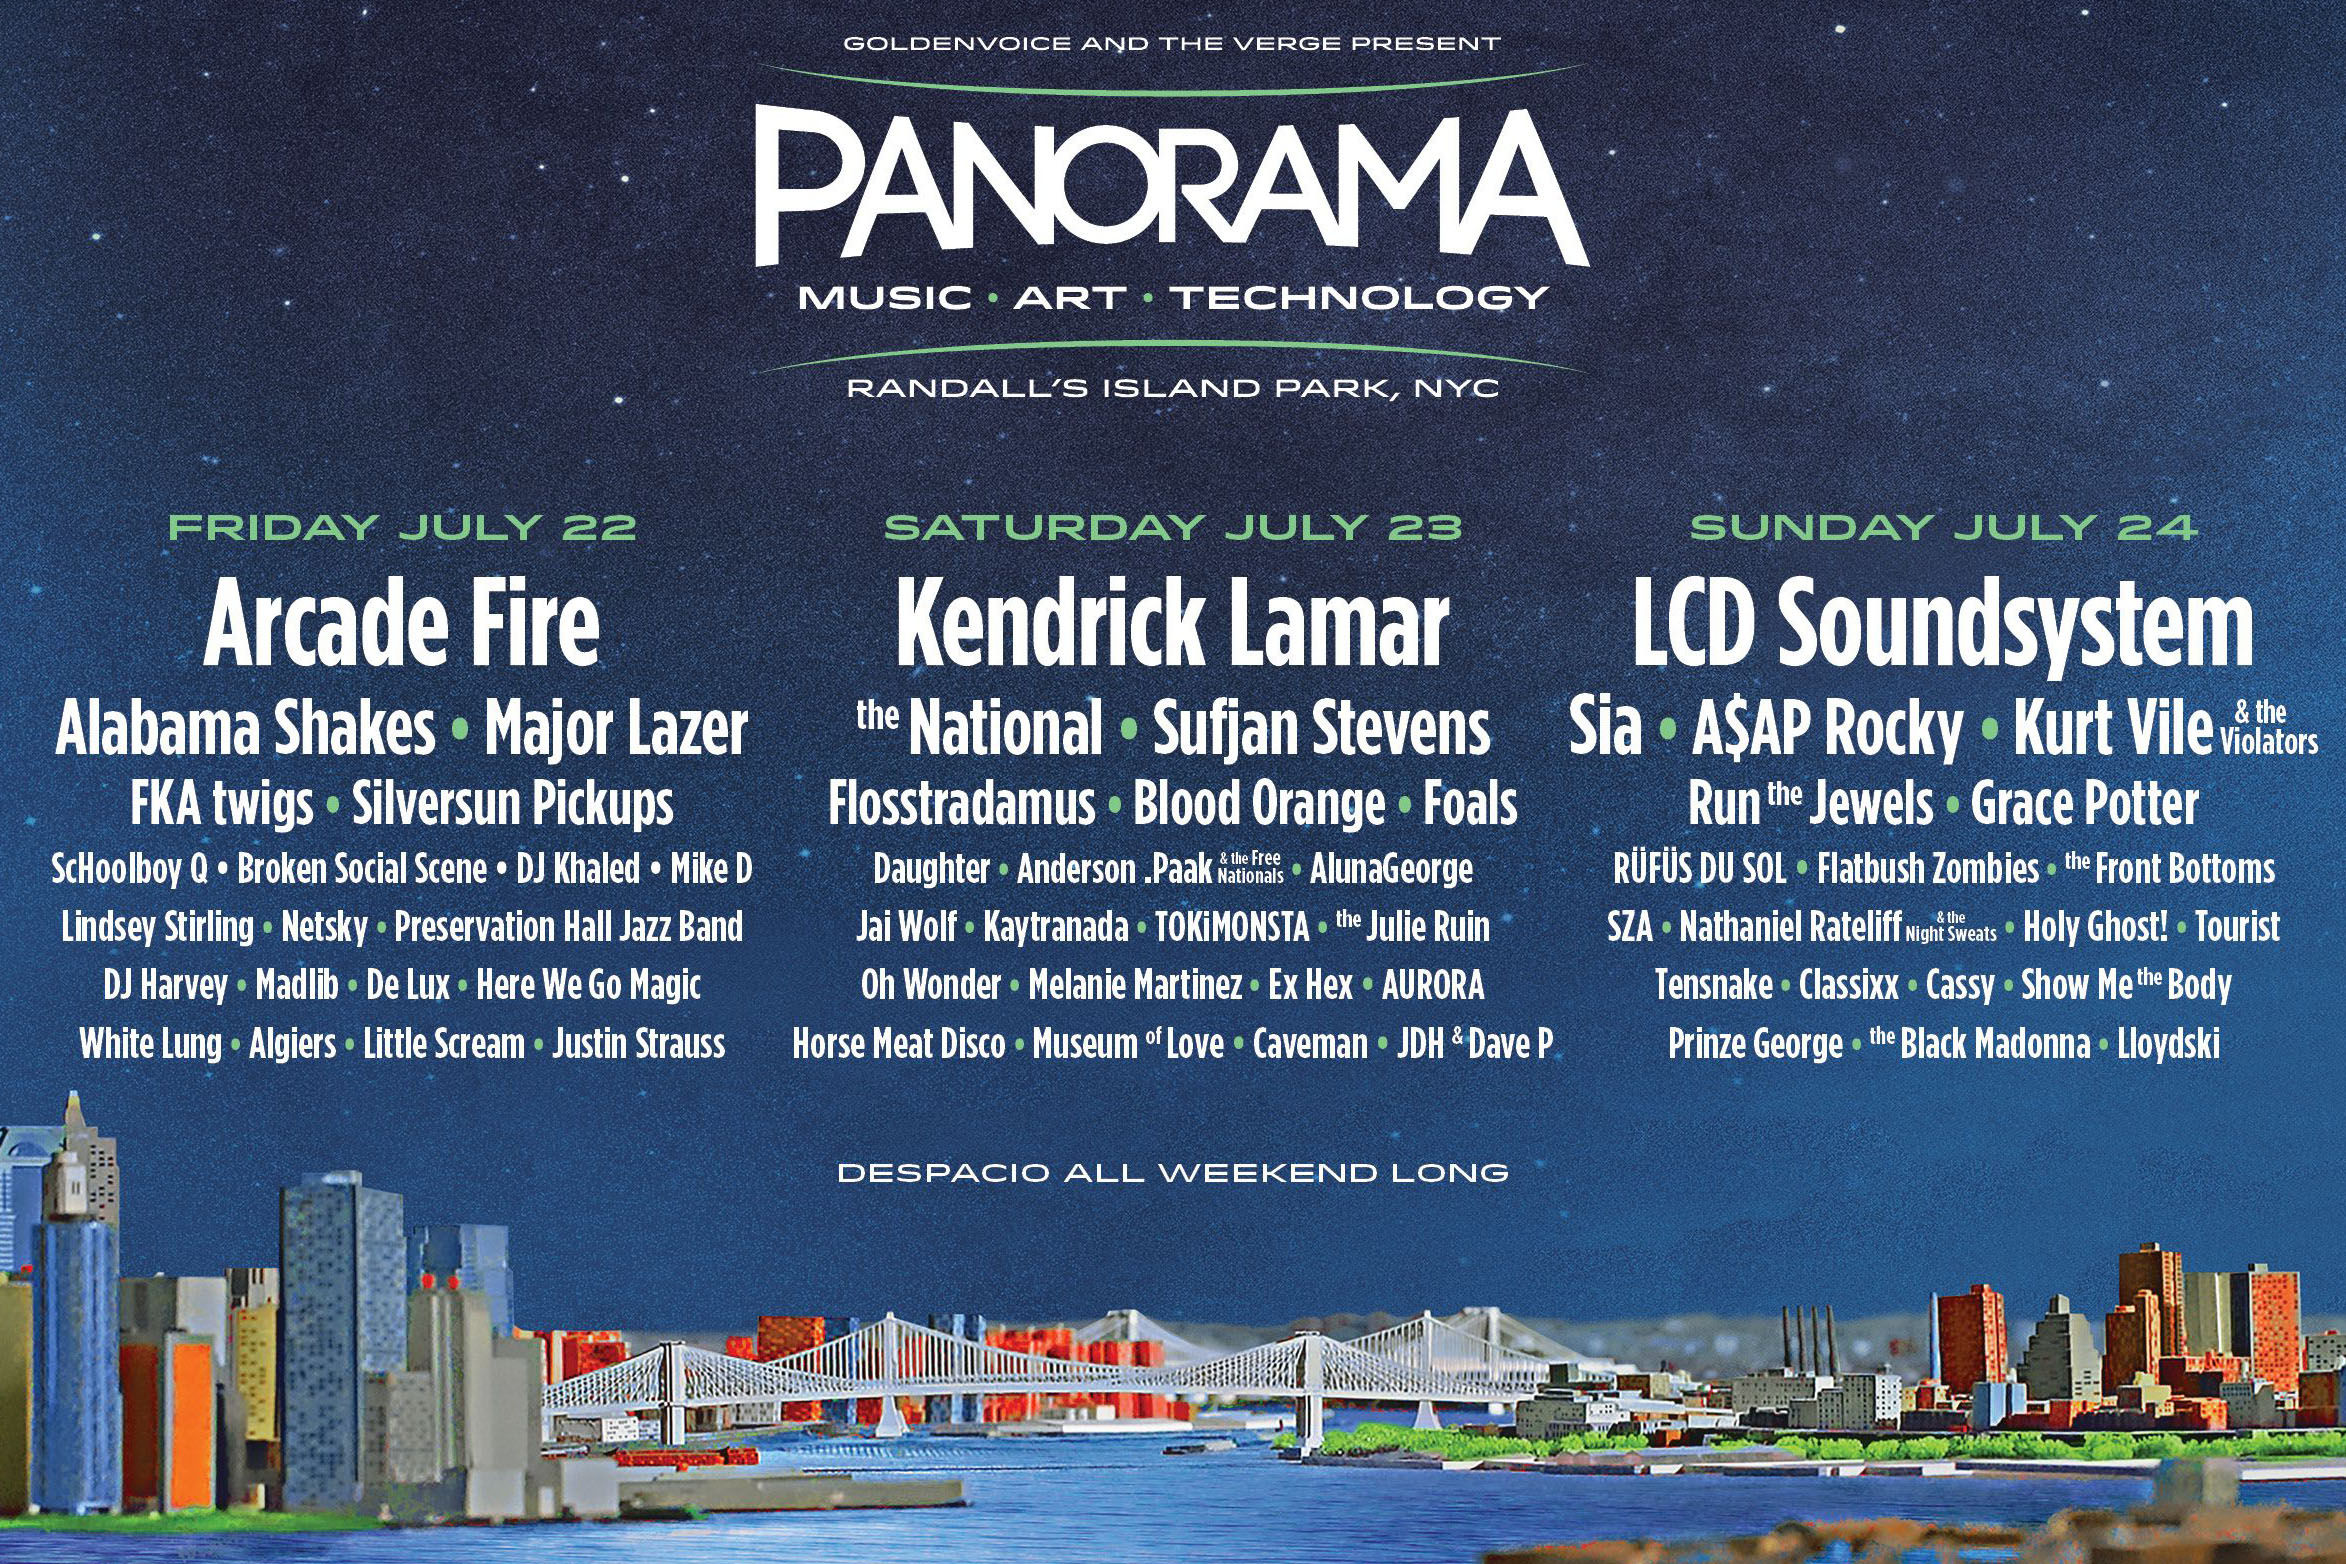 Panorama-AEG-Live-East-Coast-Coachella-Daily-Beat-New-York